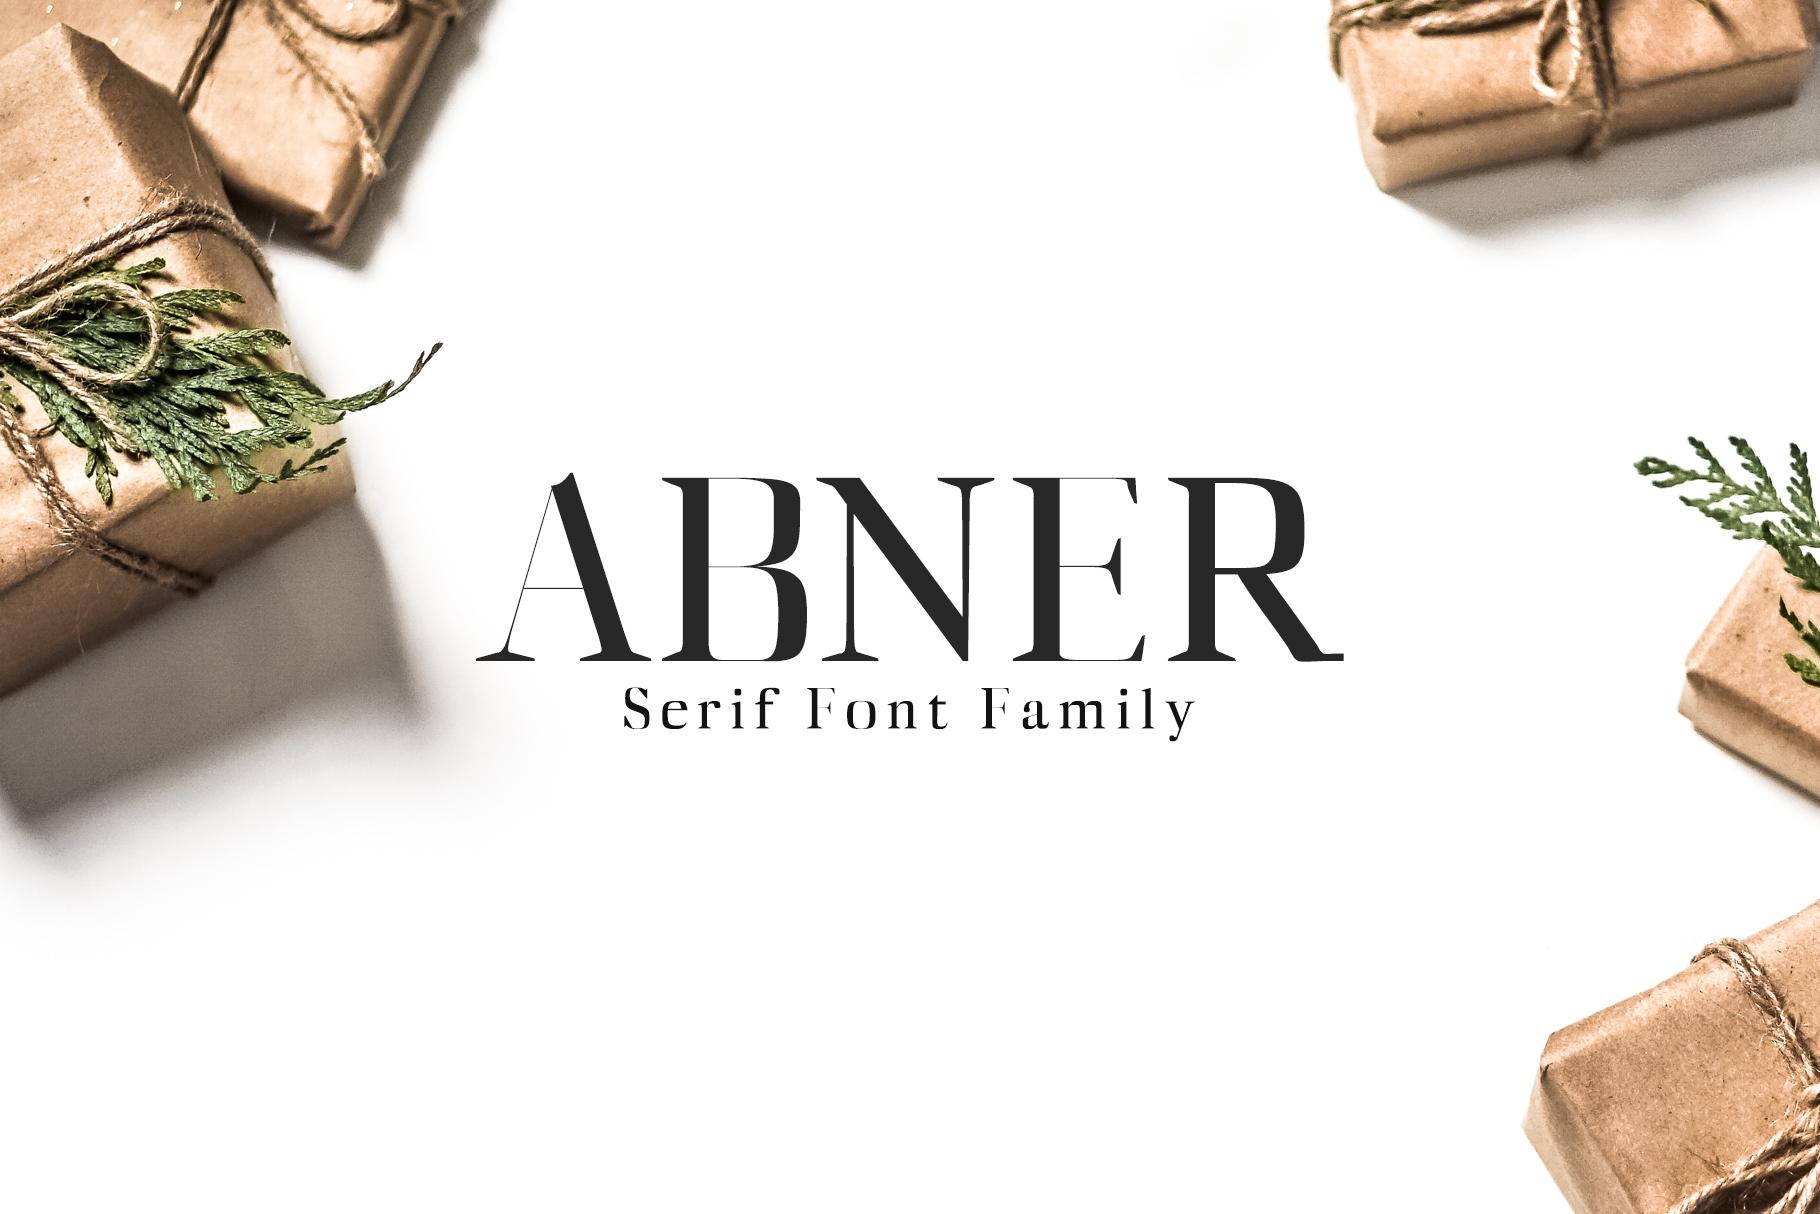 Abner Serif 6 Font Family example image 1